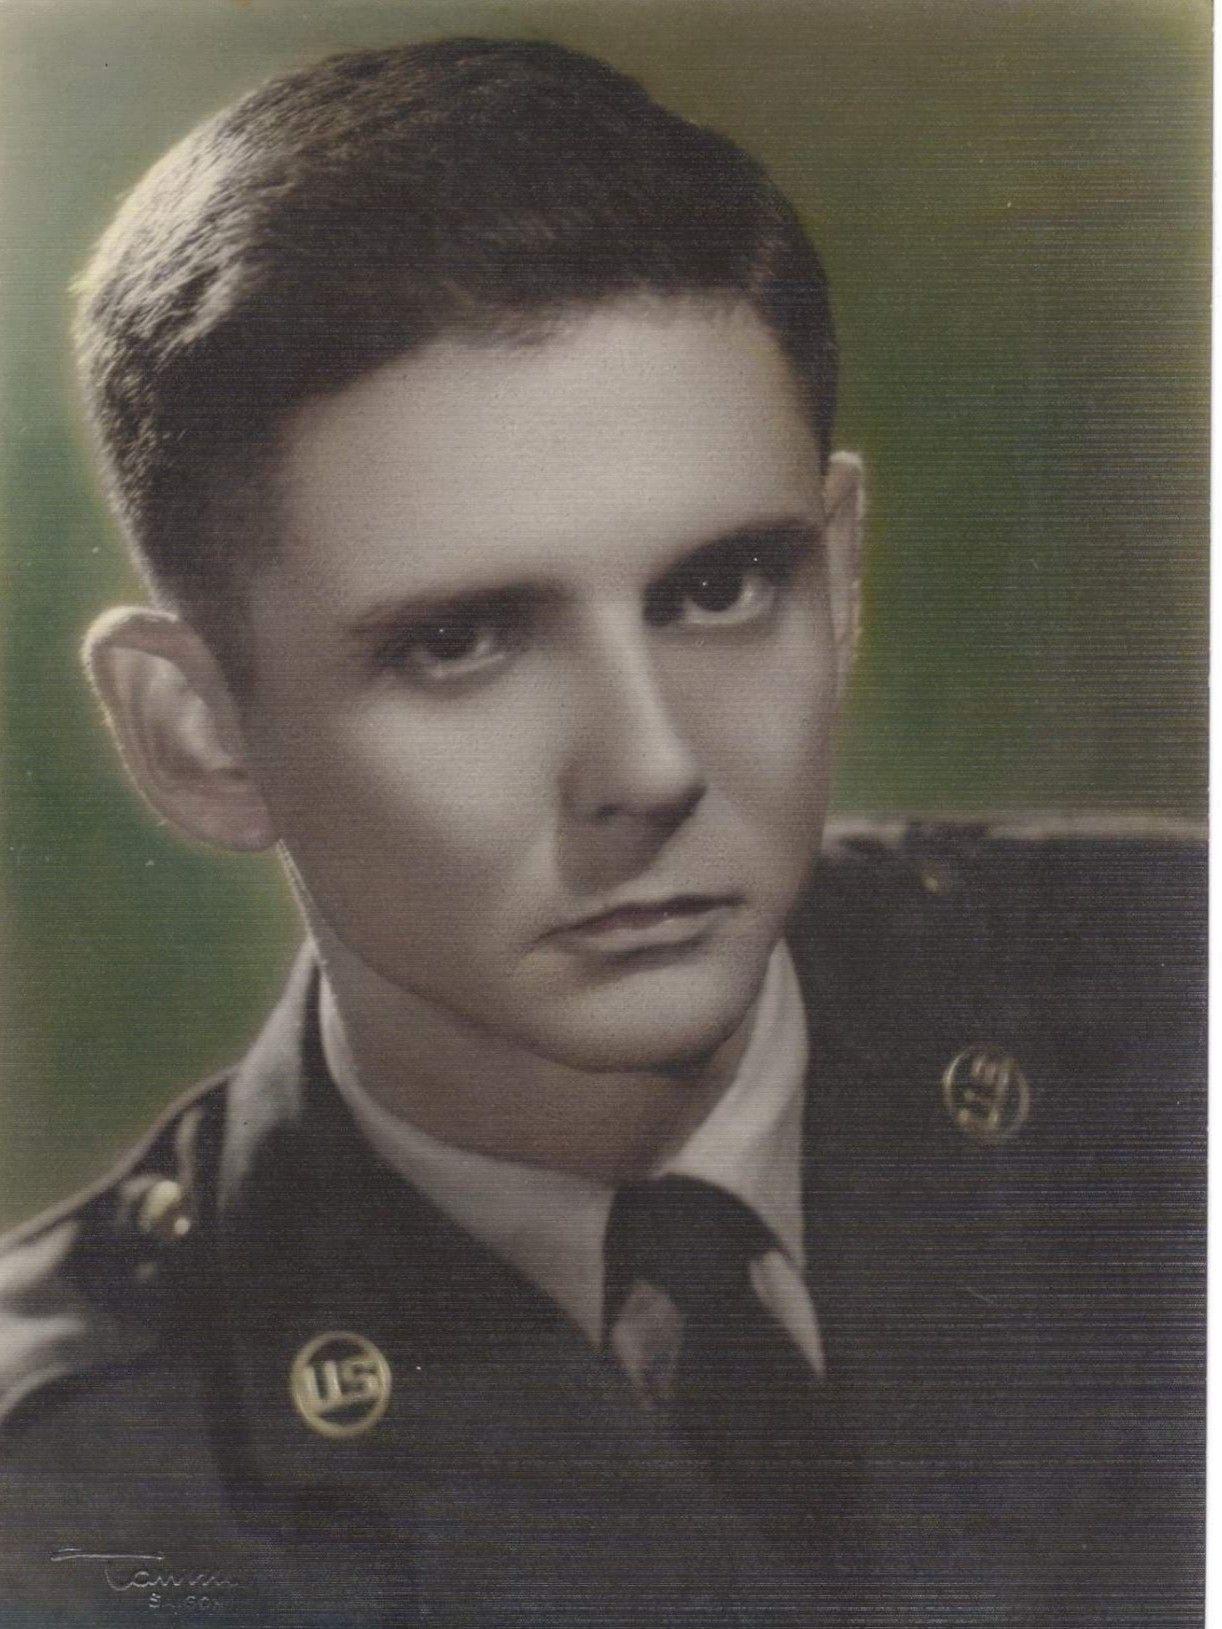 Vietnam War Hero Killed Where's the Justice Vietnam